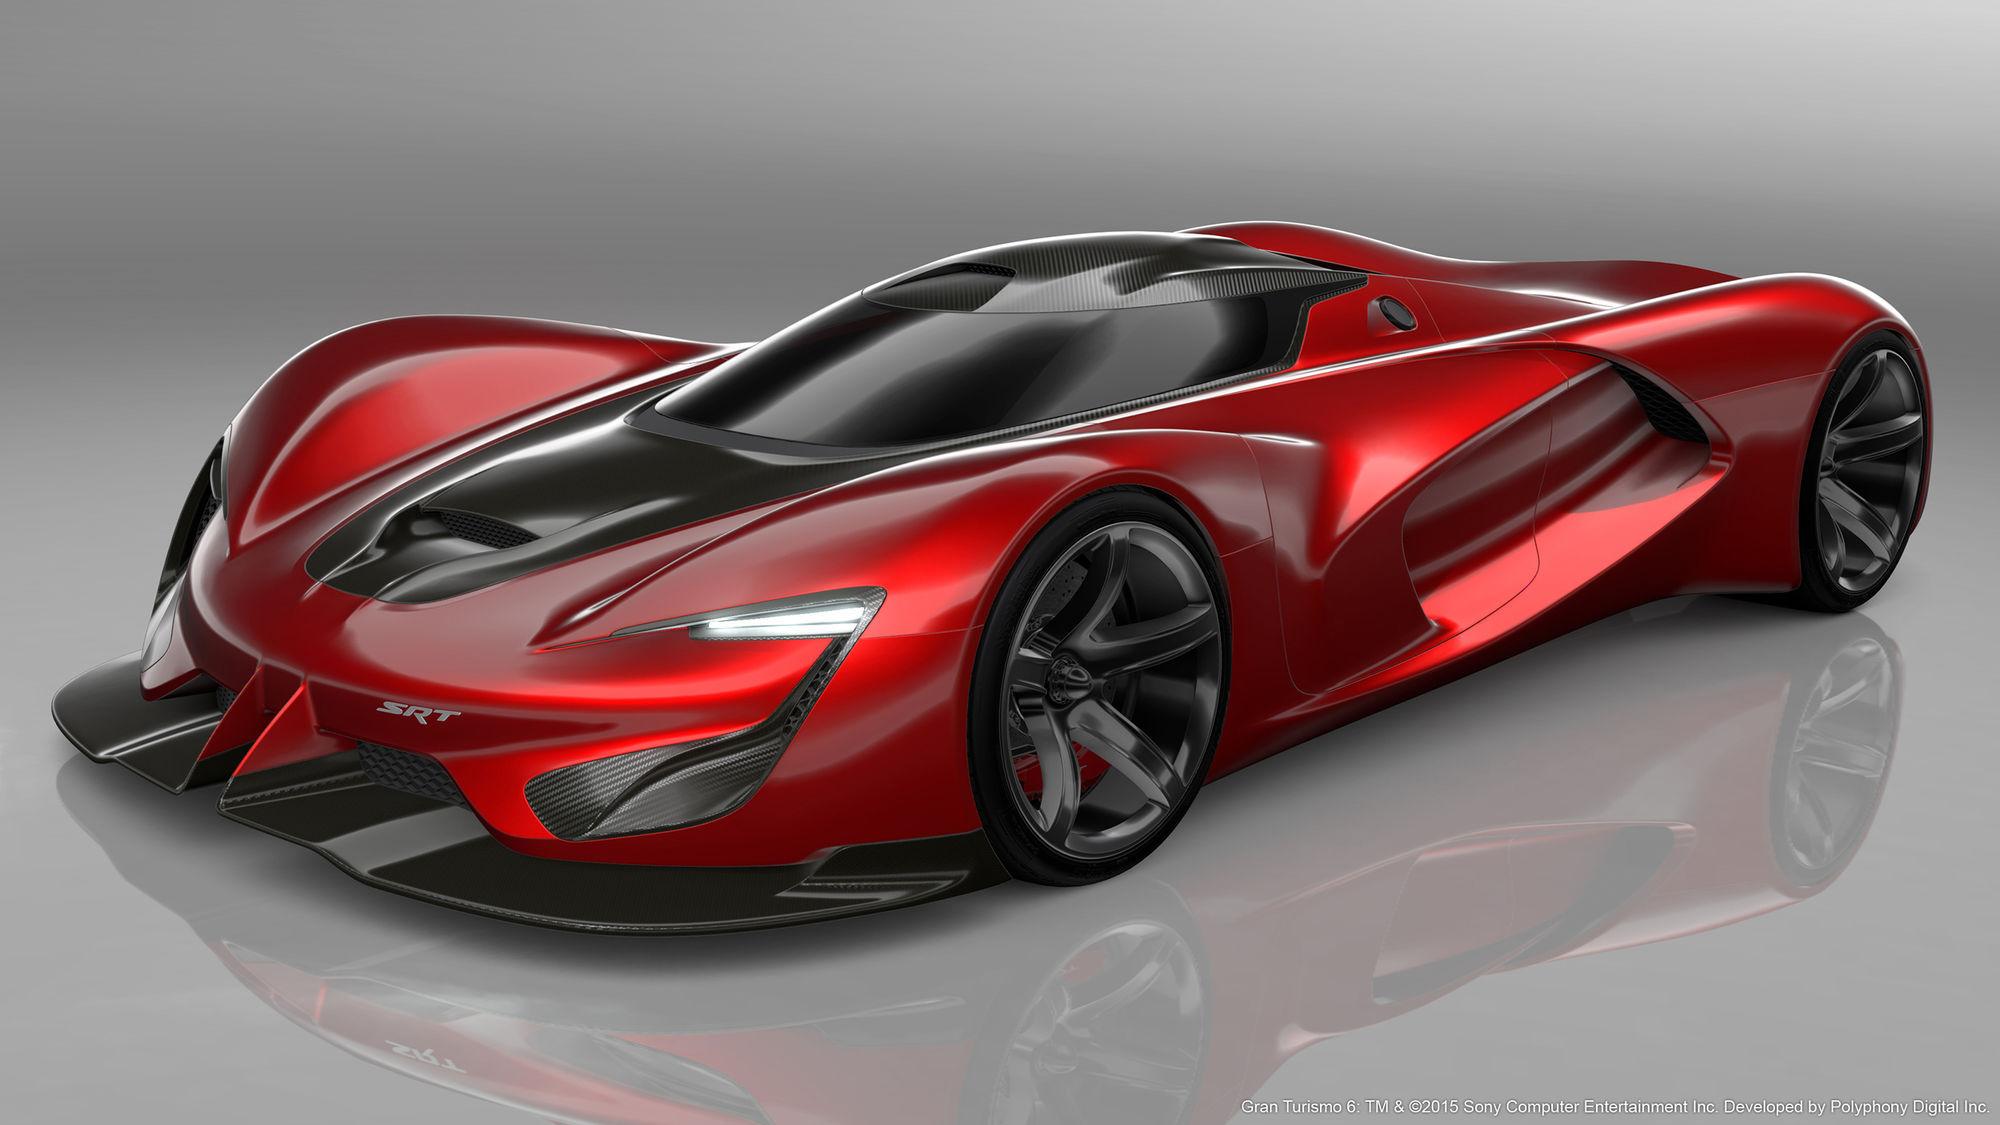 | SRT Tomahawk Vision Gran Turismo